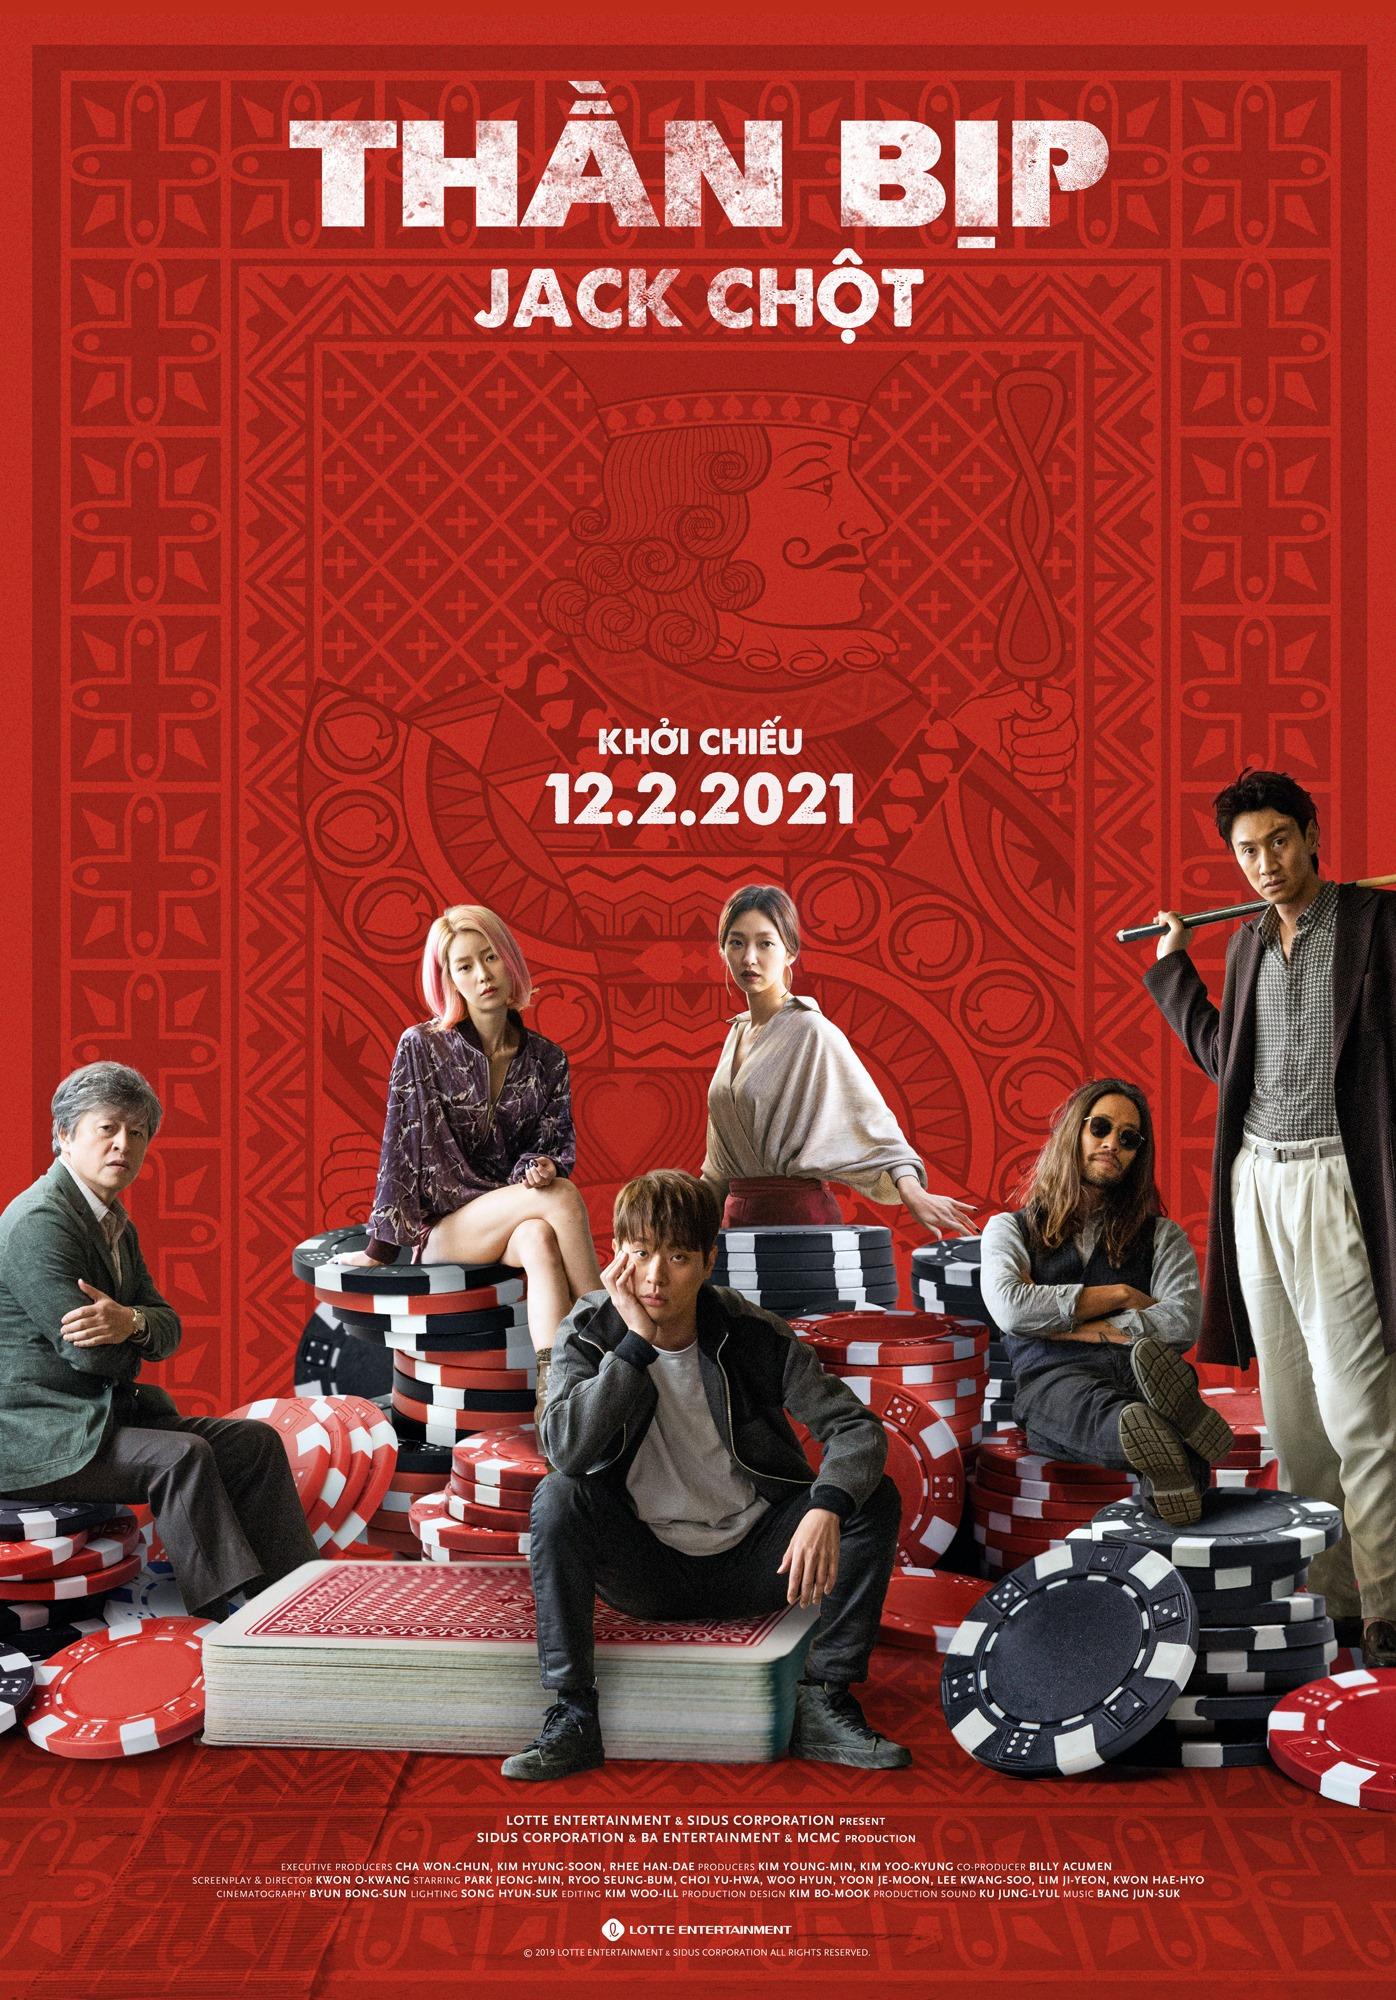 Thần Bịp: Jack Chột – Tazza: One Eyed Jack